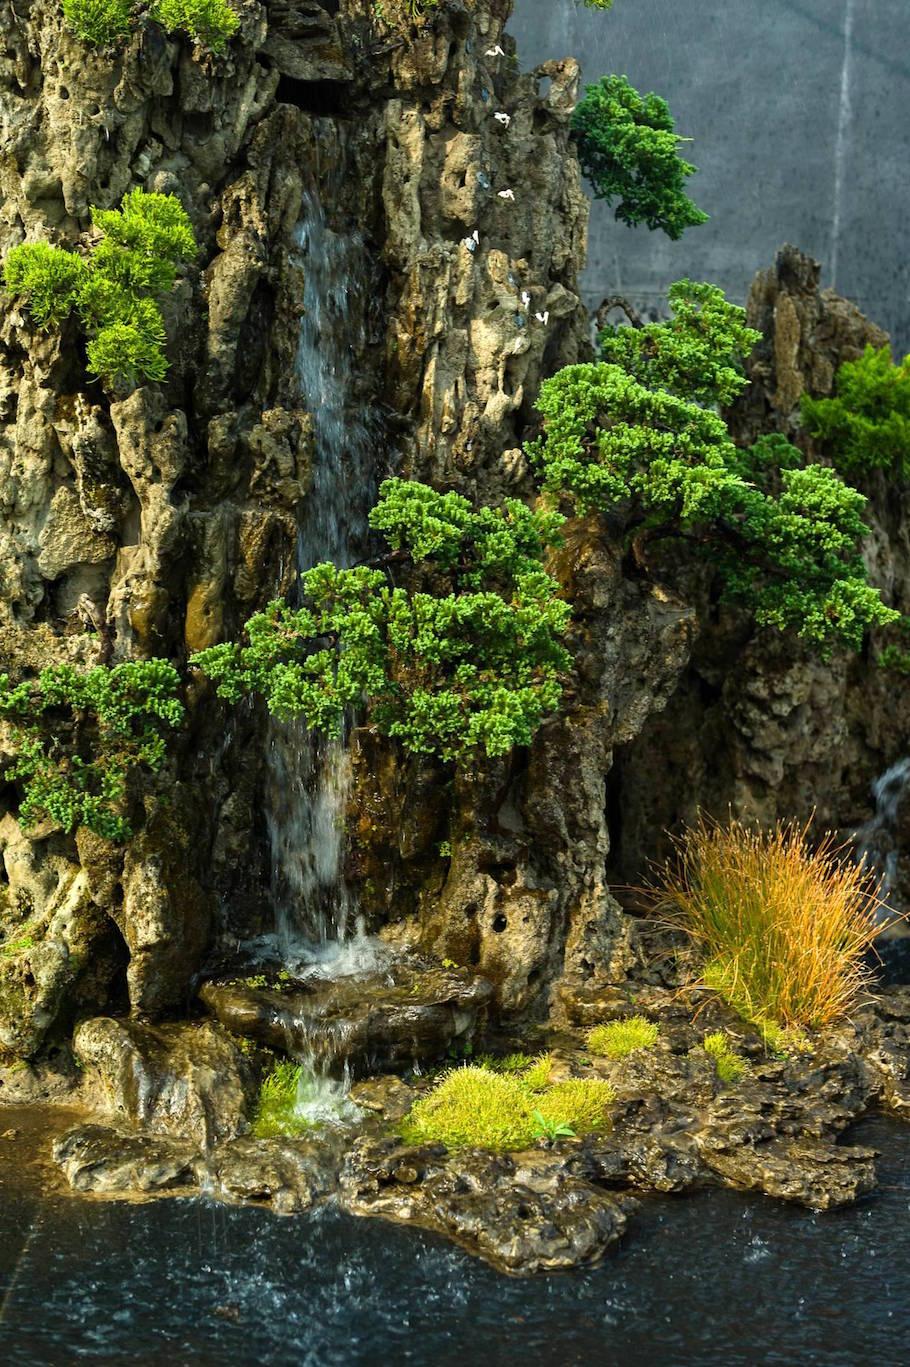 The Bonsai Landscape Bonsai Empire